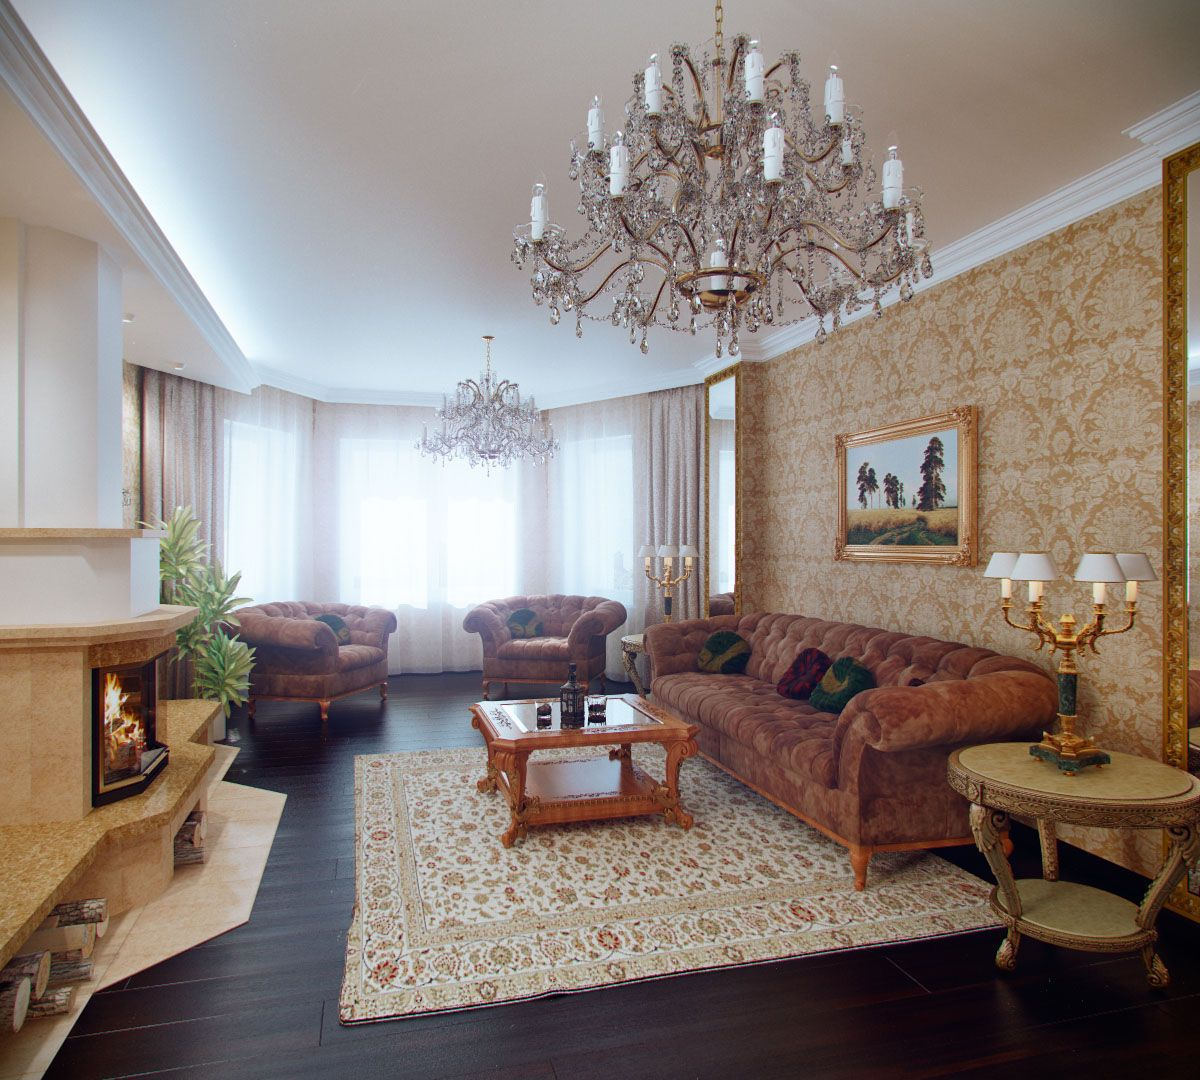 Bohemian Style Living Room Ideas Bohemian Style Living Room Bohemian Style Living Room E Living Room Wall Designs Elle Decor Living Room Vintage Living Room